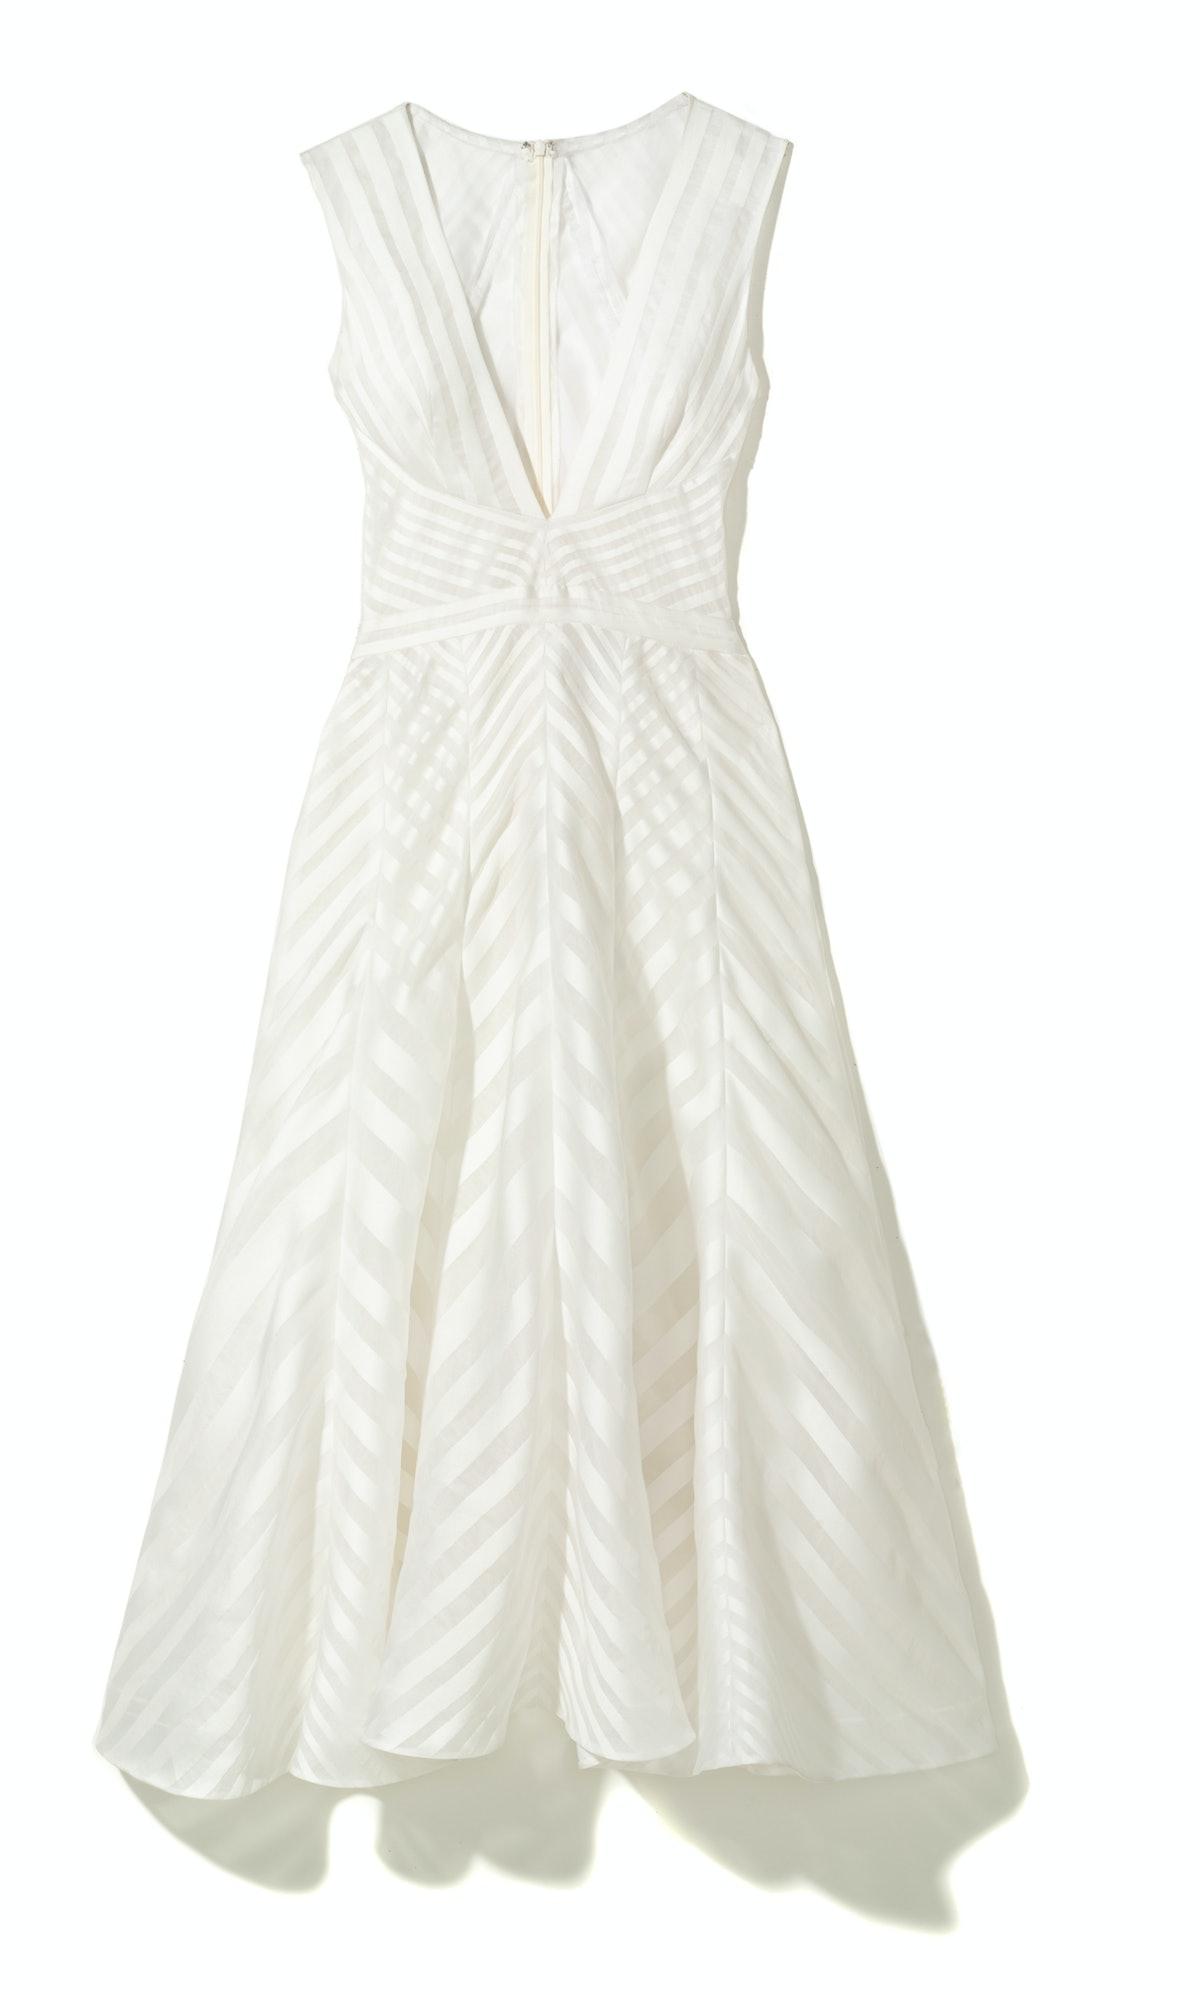 J. Mendel dress, $3,850, jmendel.com.